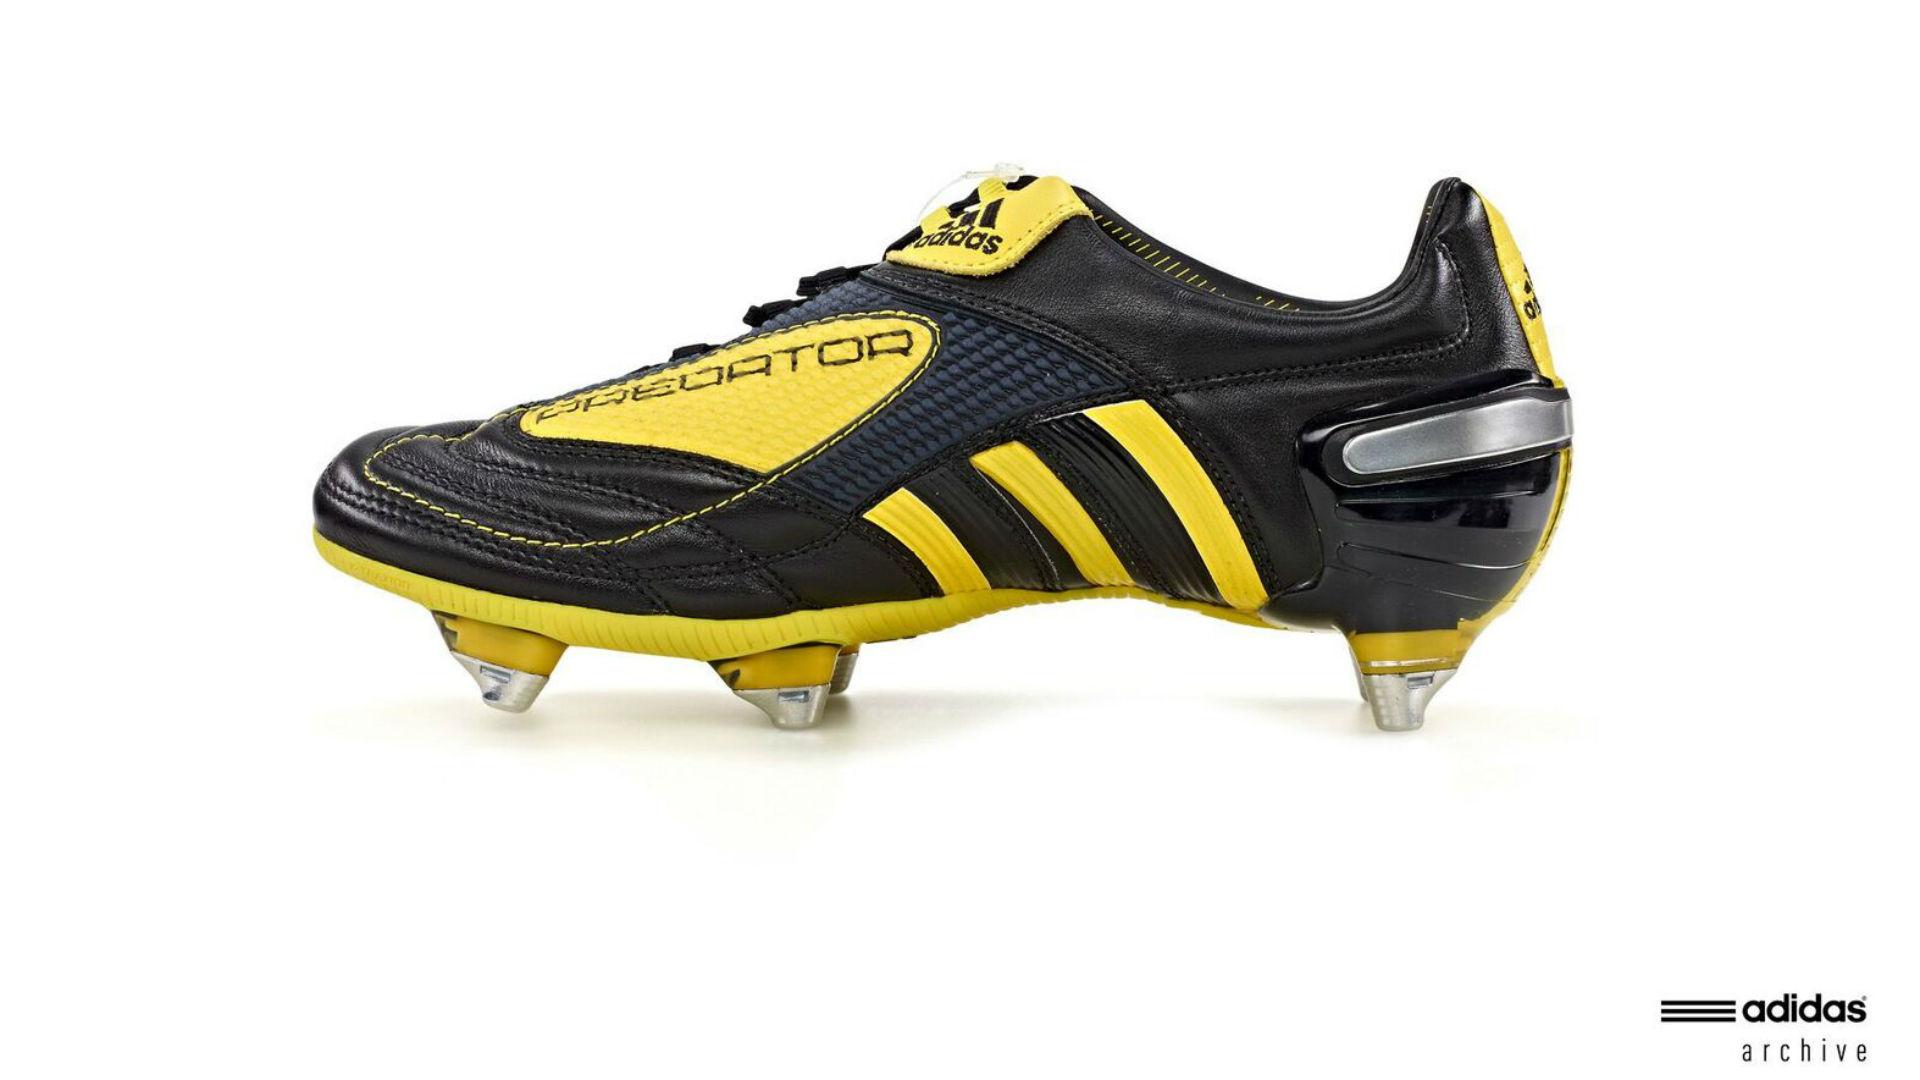 1b97ca1d8bae where can i buy adidas predator 2010 ec3fd f9d37